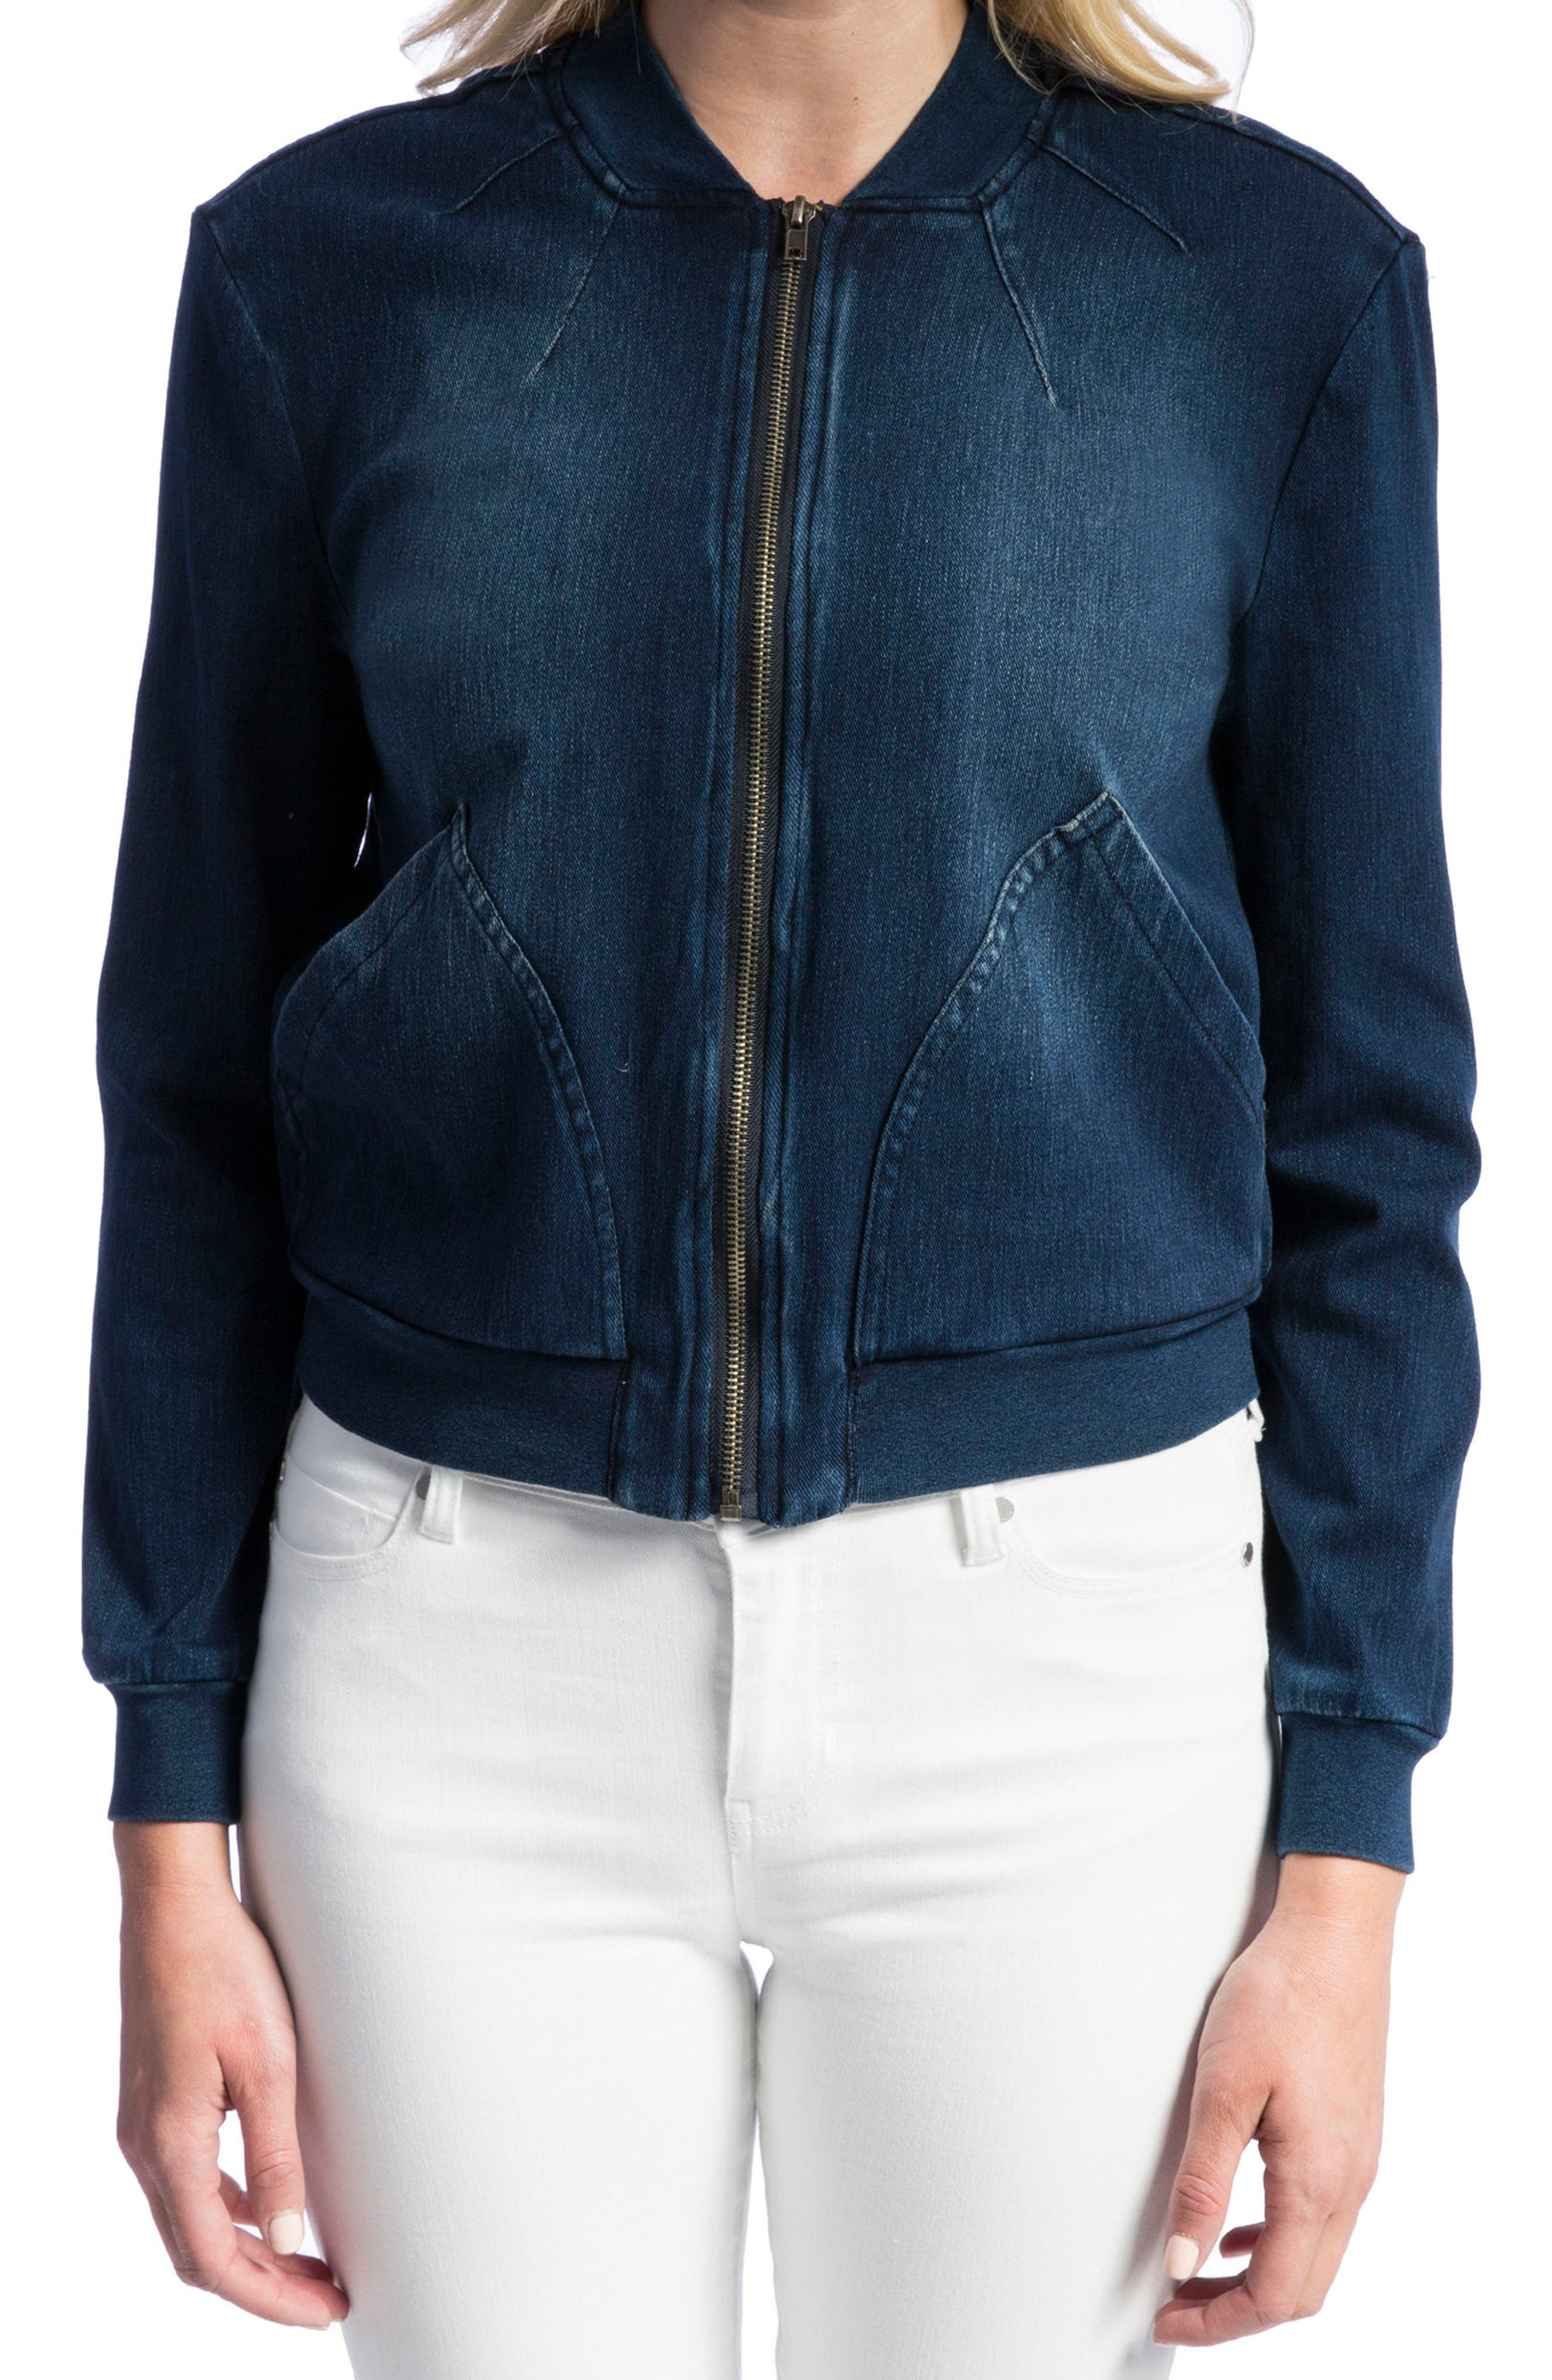 Alternate Image 1 Selected - Liverpool Jeans Company Denim Knit Bomber Jacket